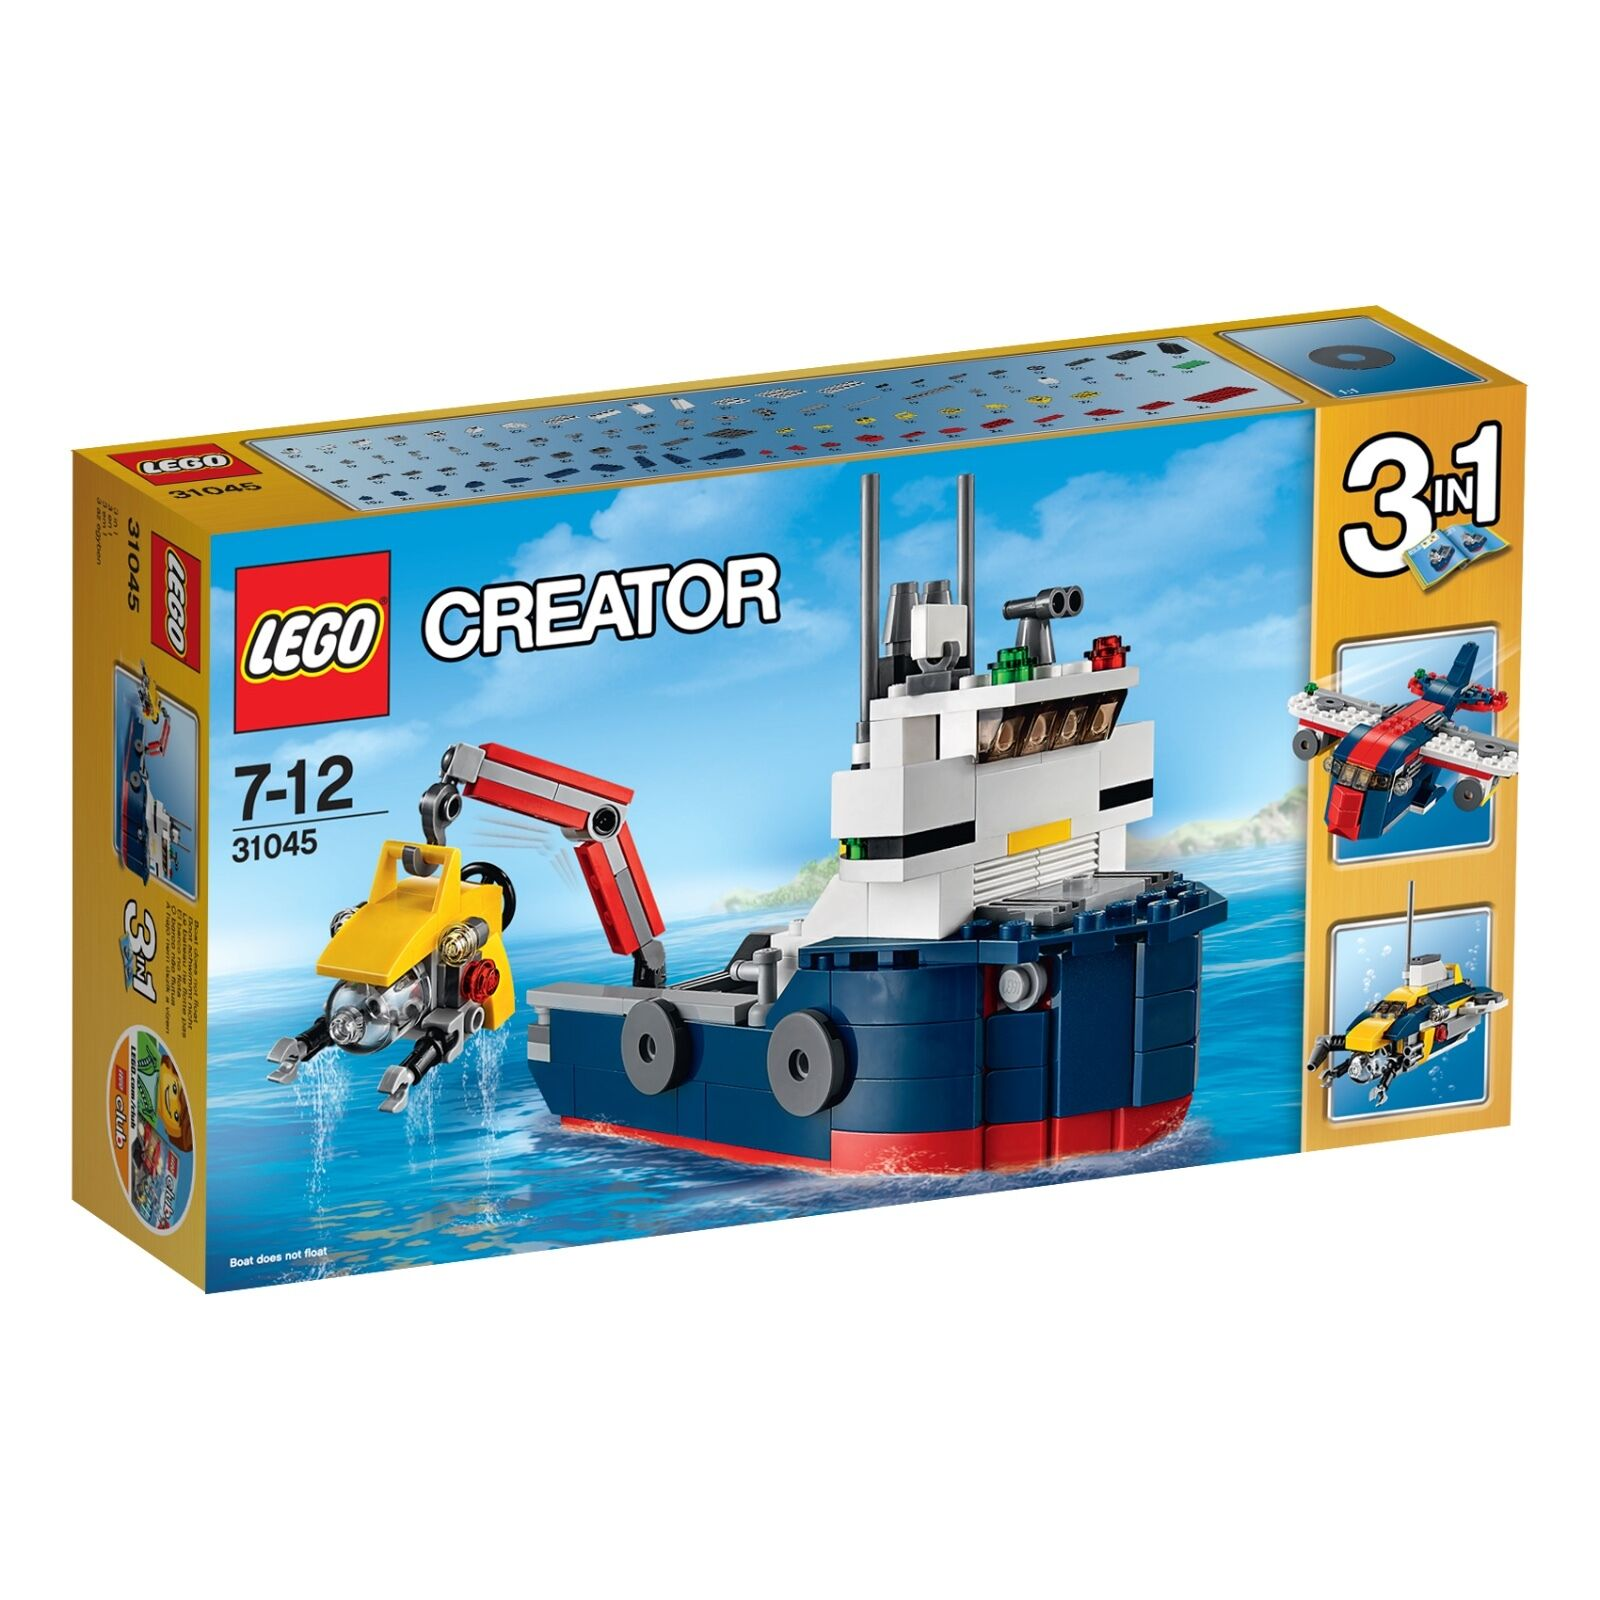 LEGO® Creator 31045 Erforscher der Meere NEU OVP_ Ocean Explorer NEW MISB NRFB